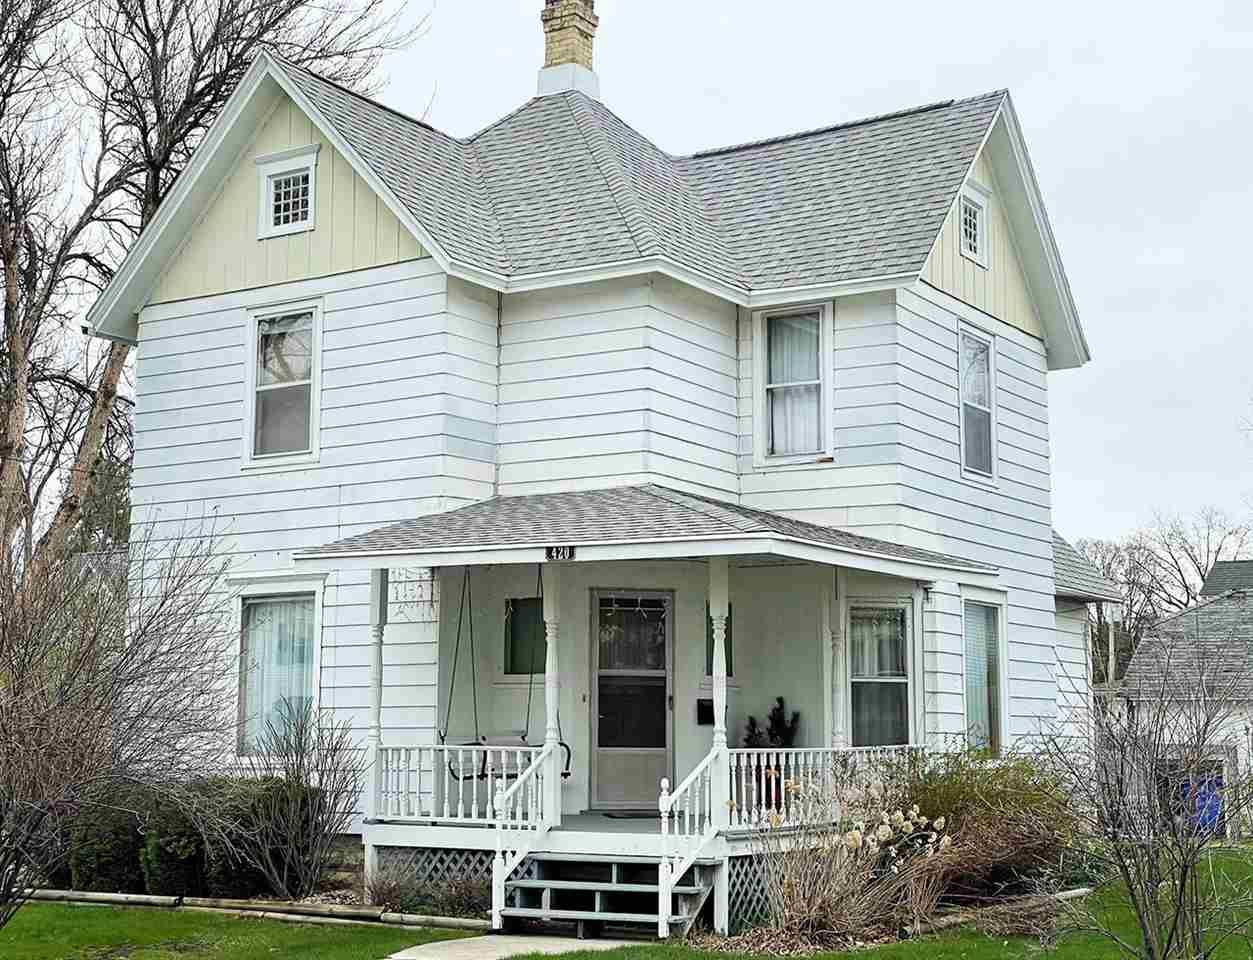 420 N High St, Randolph, WI 53956 - #: 1906326